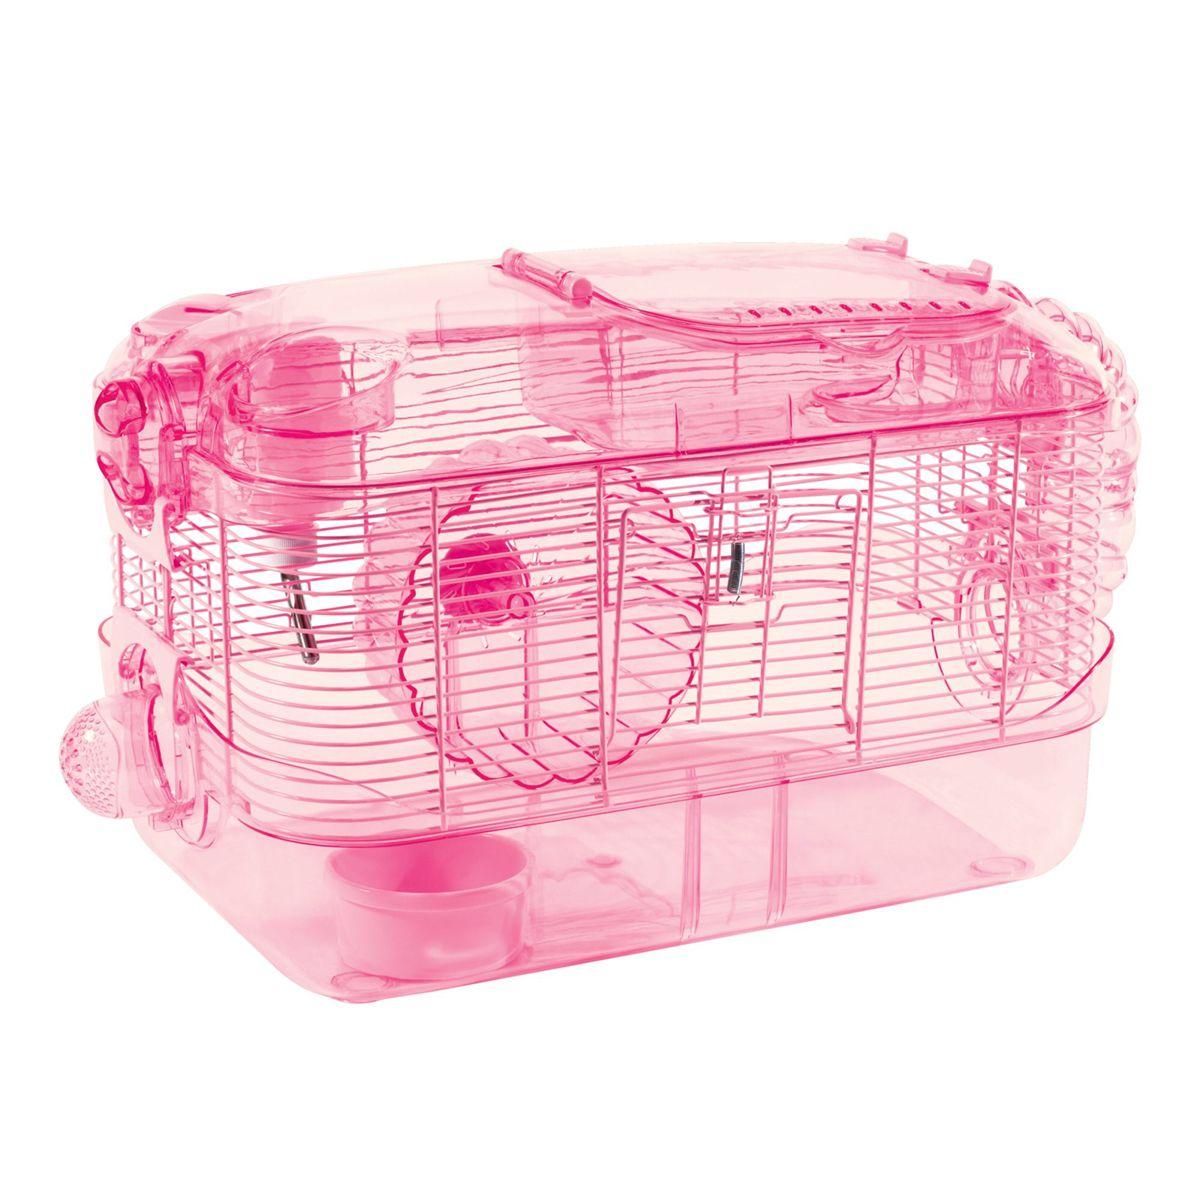 Kaytee Crittertrail One Level Pink Habitat In 2020 Small Pets Habitats Pet Cage